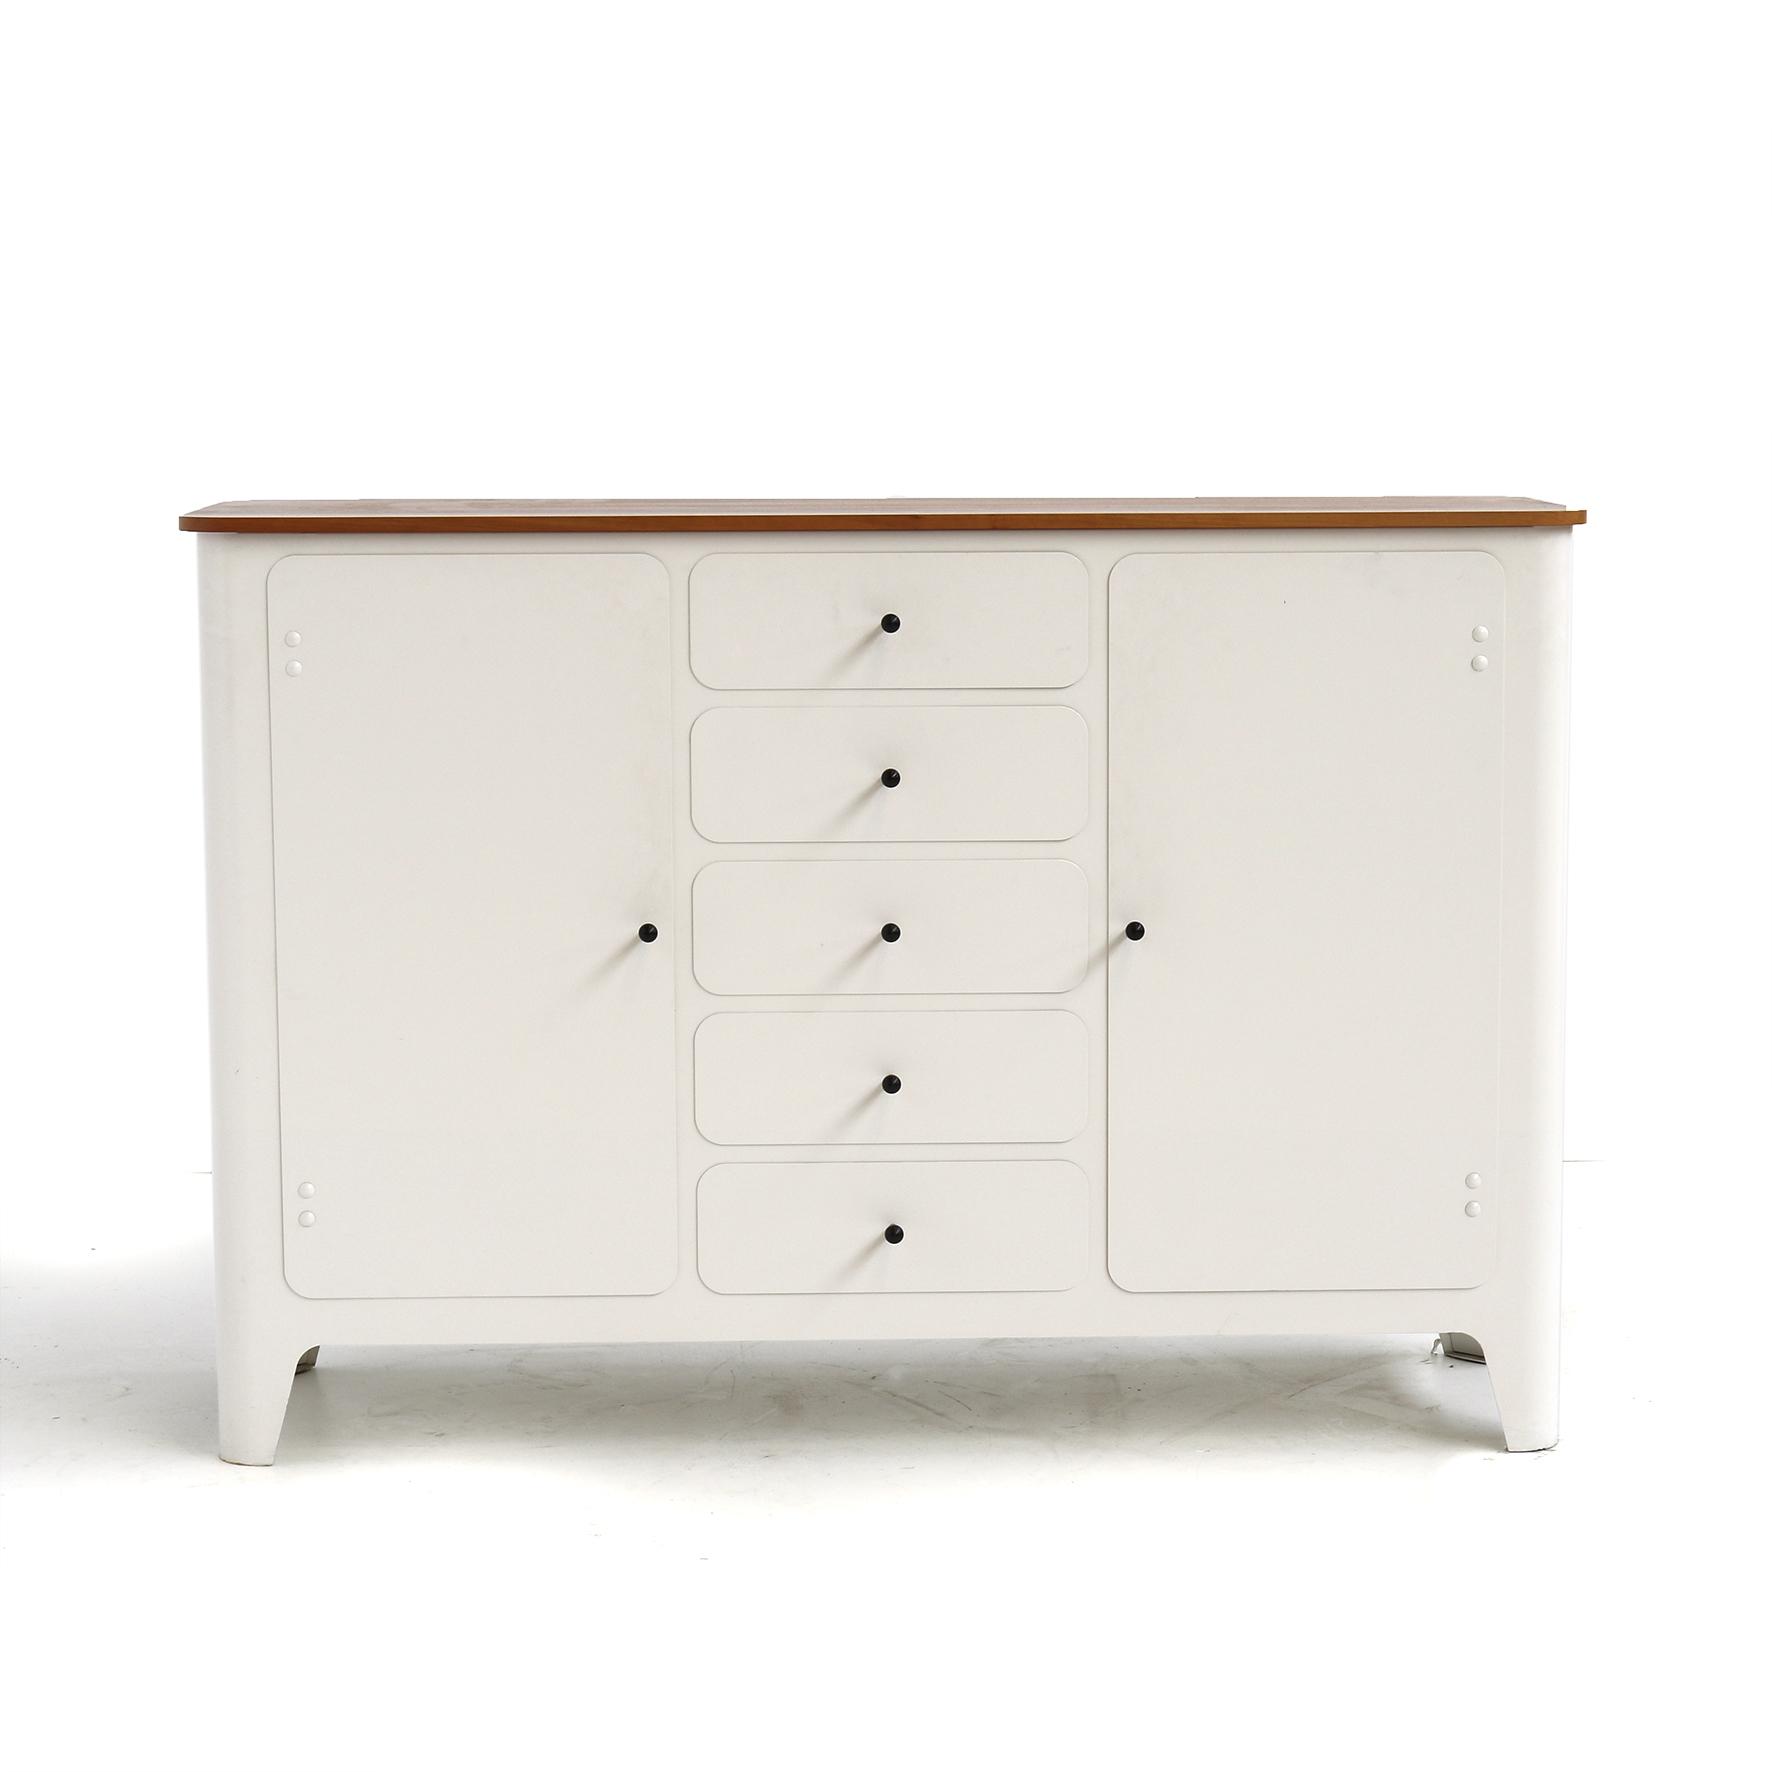 Sheetsteel cabinet – kast